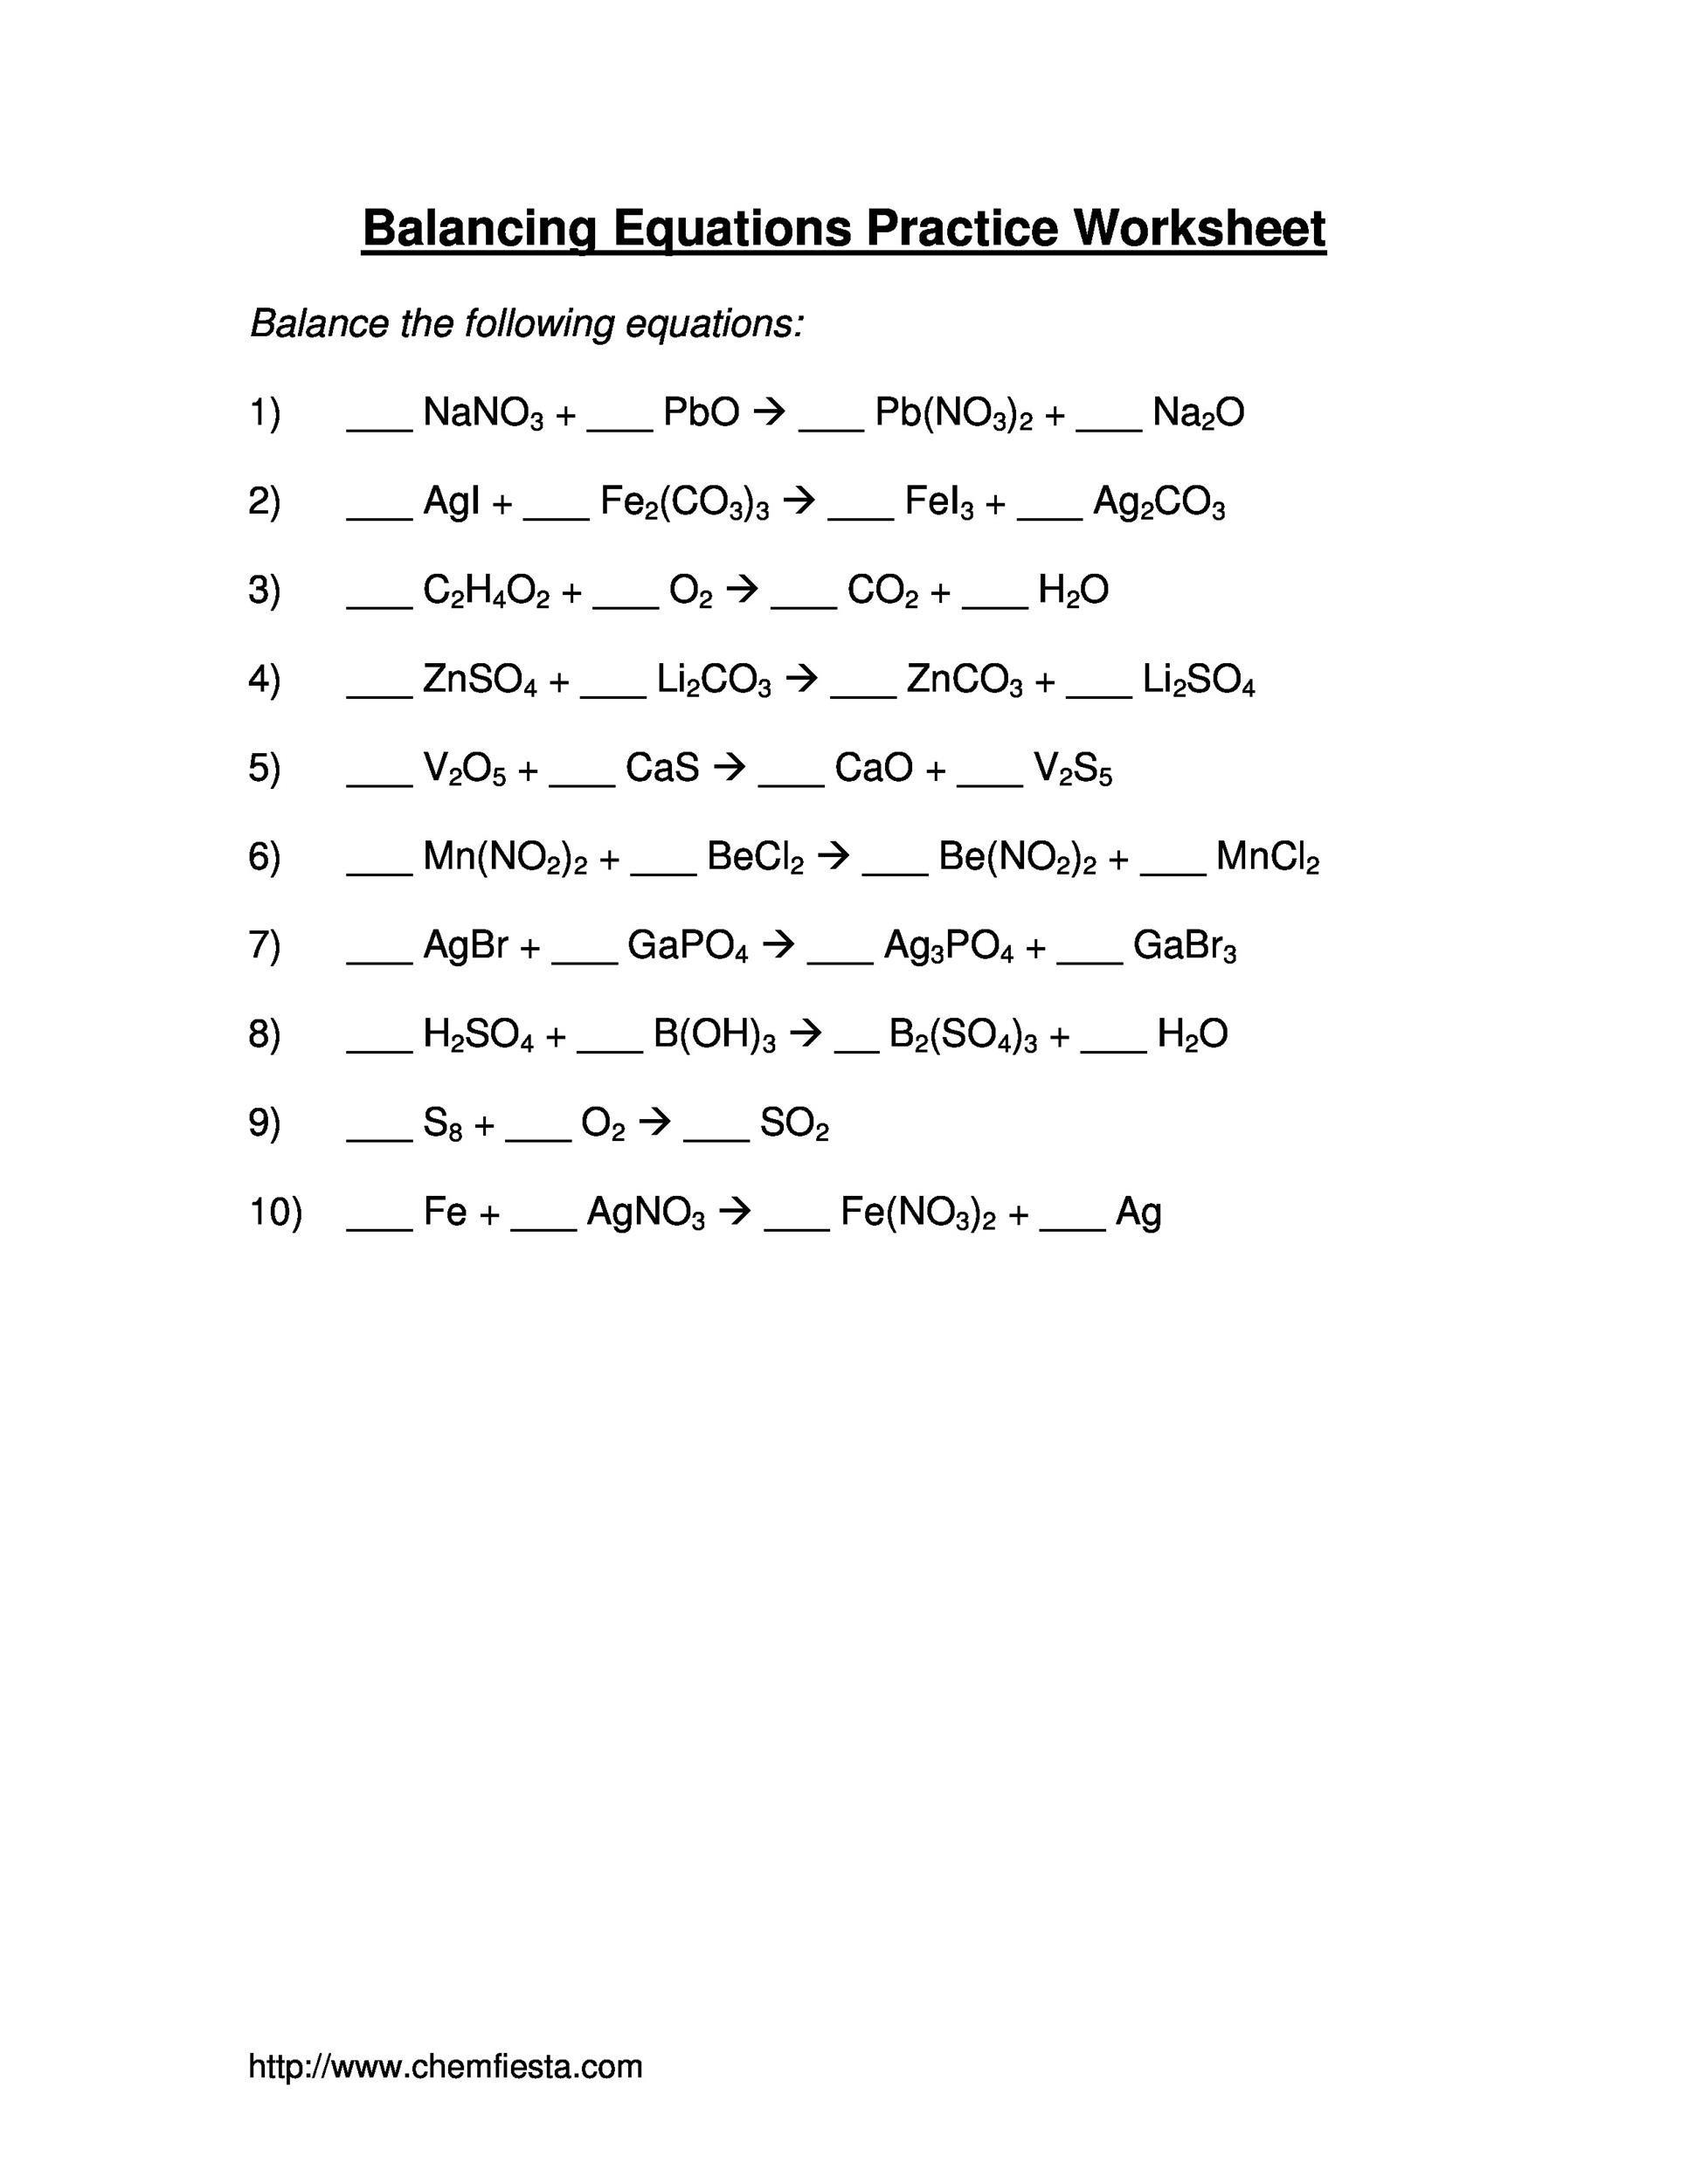 medium resolution of 25 Understanding Chemical Equations Worksheet Answers - Worksheet Resource  Plans